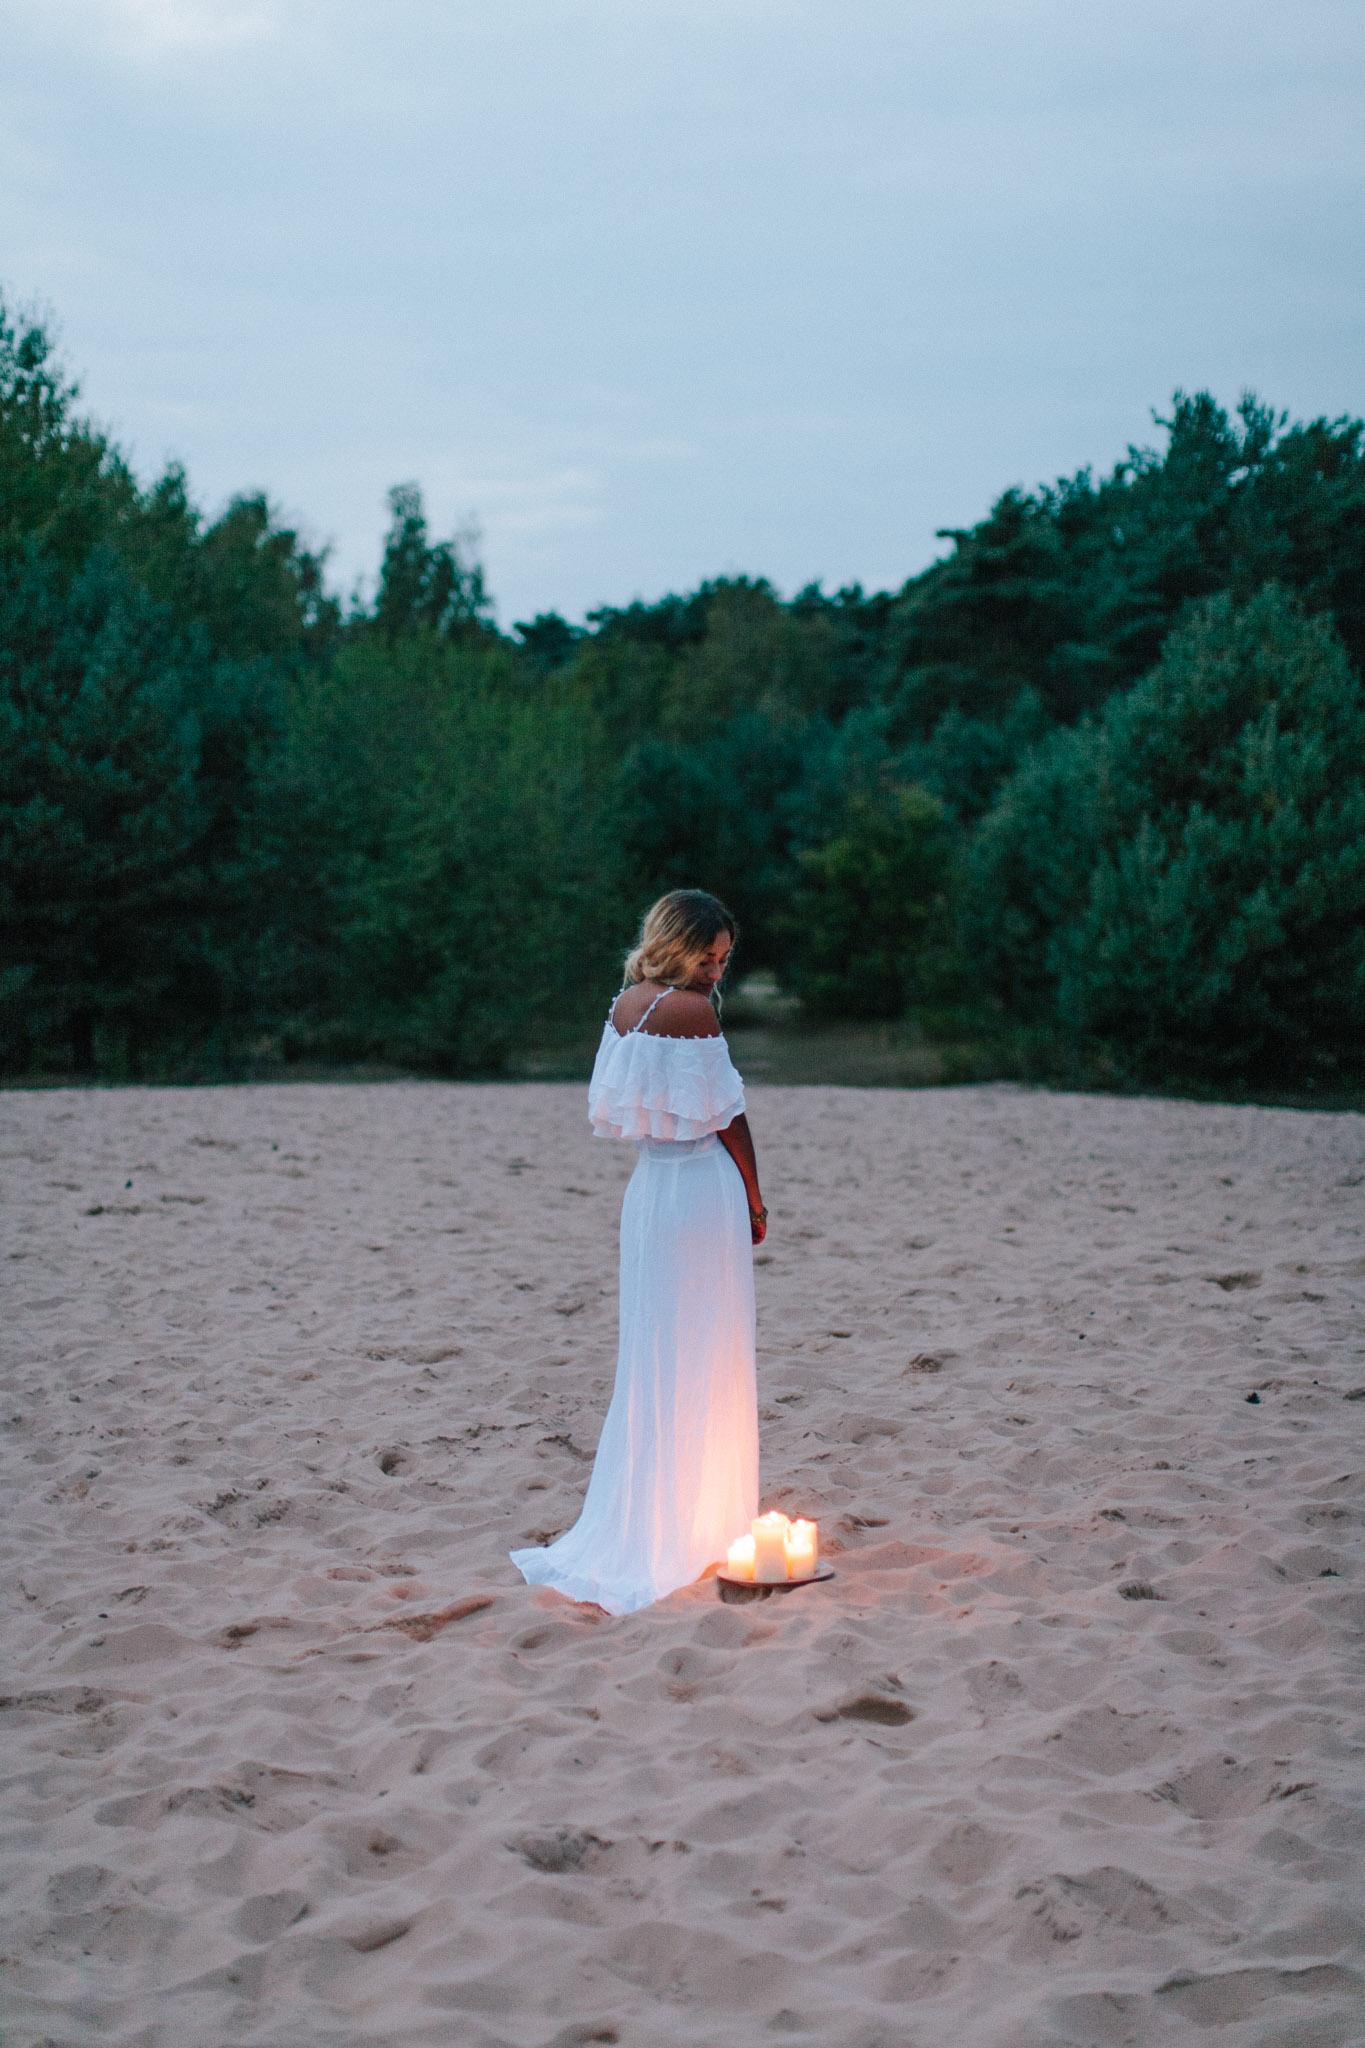 Speyer-Moroccan-Wedding-Inspiration-Pia-Anna-Christian-Wedding-Photography-S-88.jpg